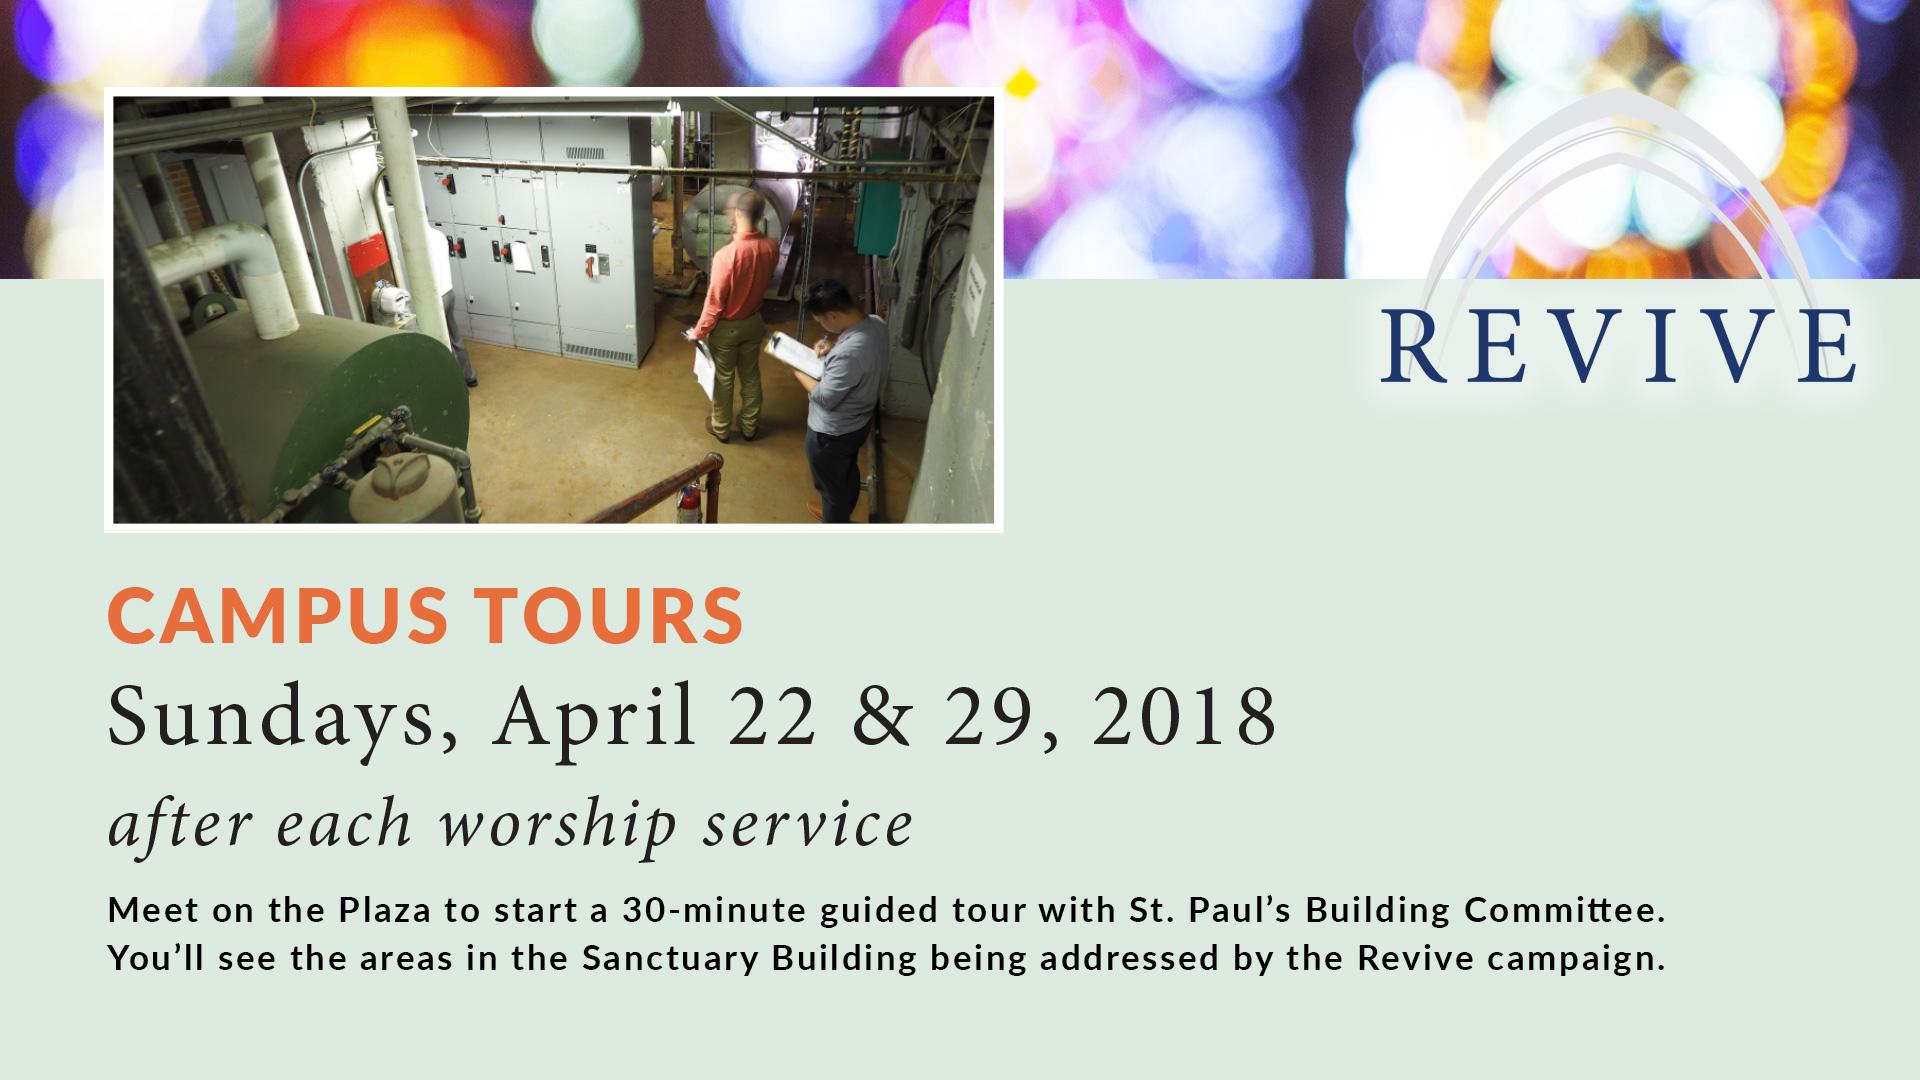 04-22-18 - 16x9-campaign-campus-tours.jpg